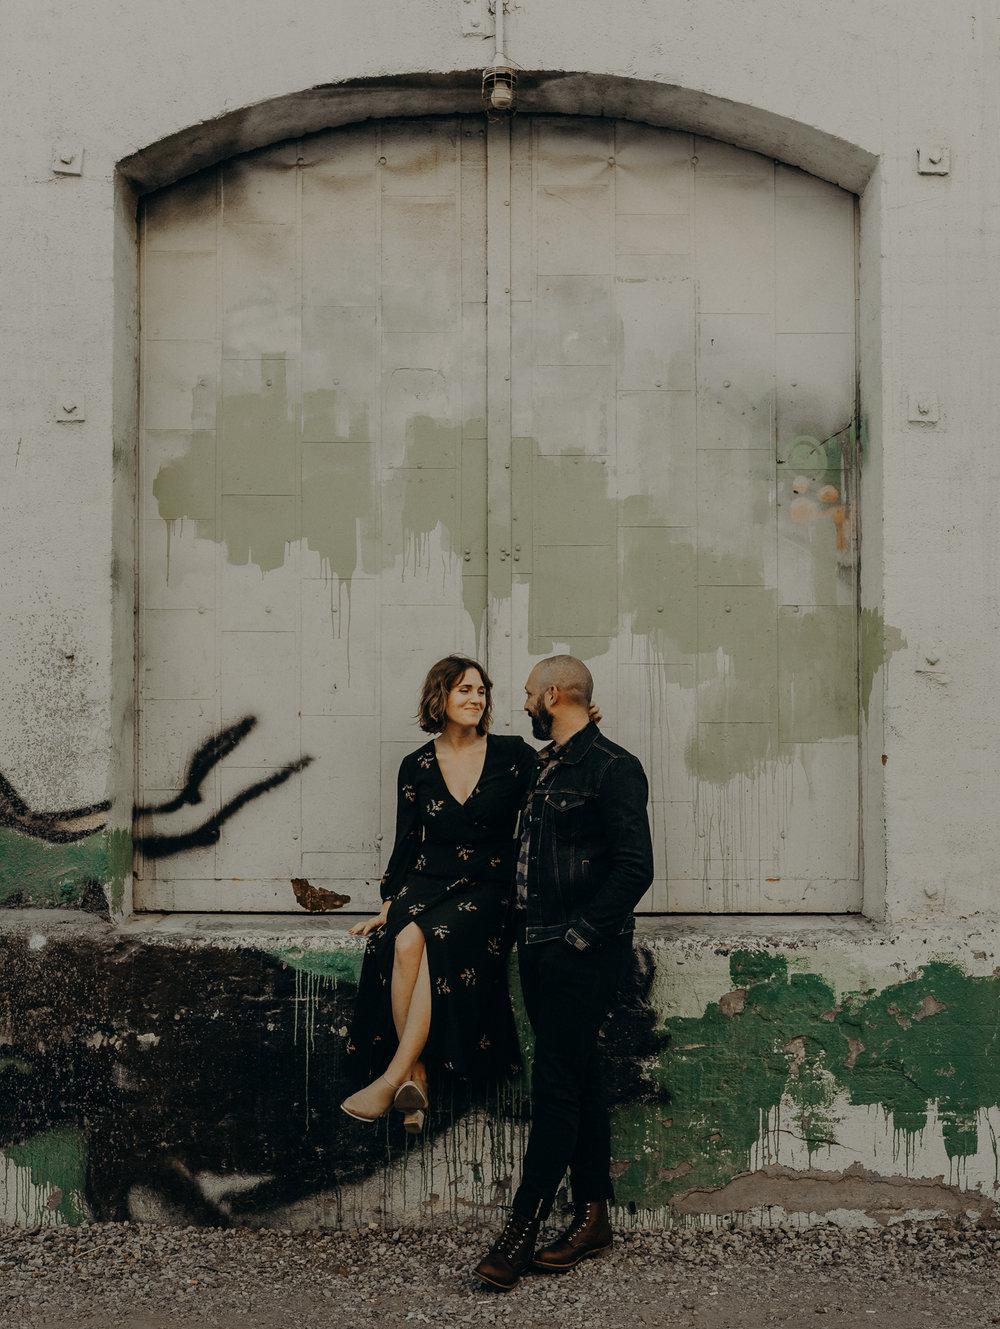 Isaiah + Taylor Photography - Reese + Jonathan Engagement08.jpg